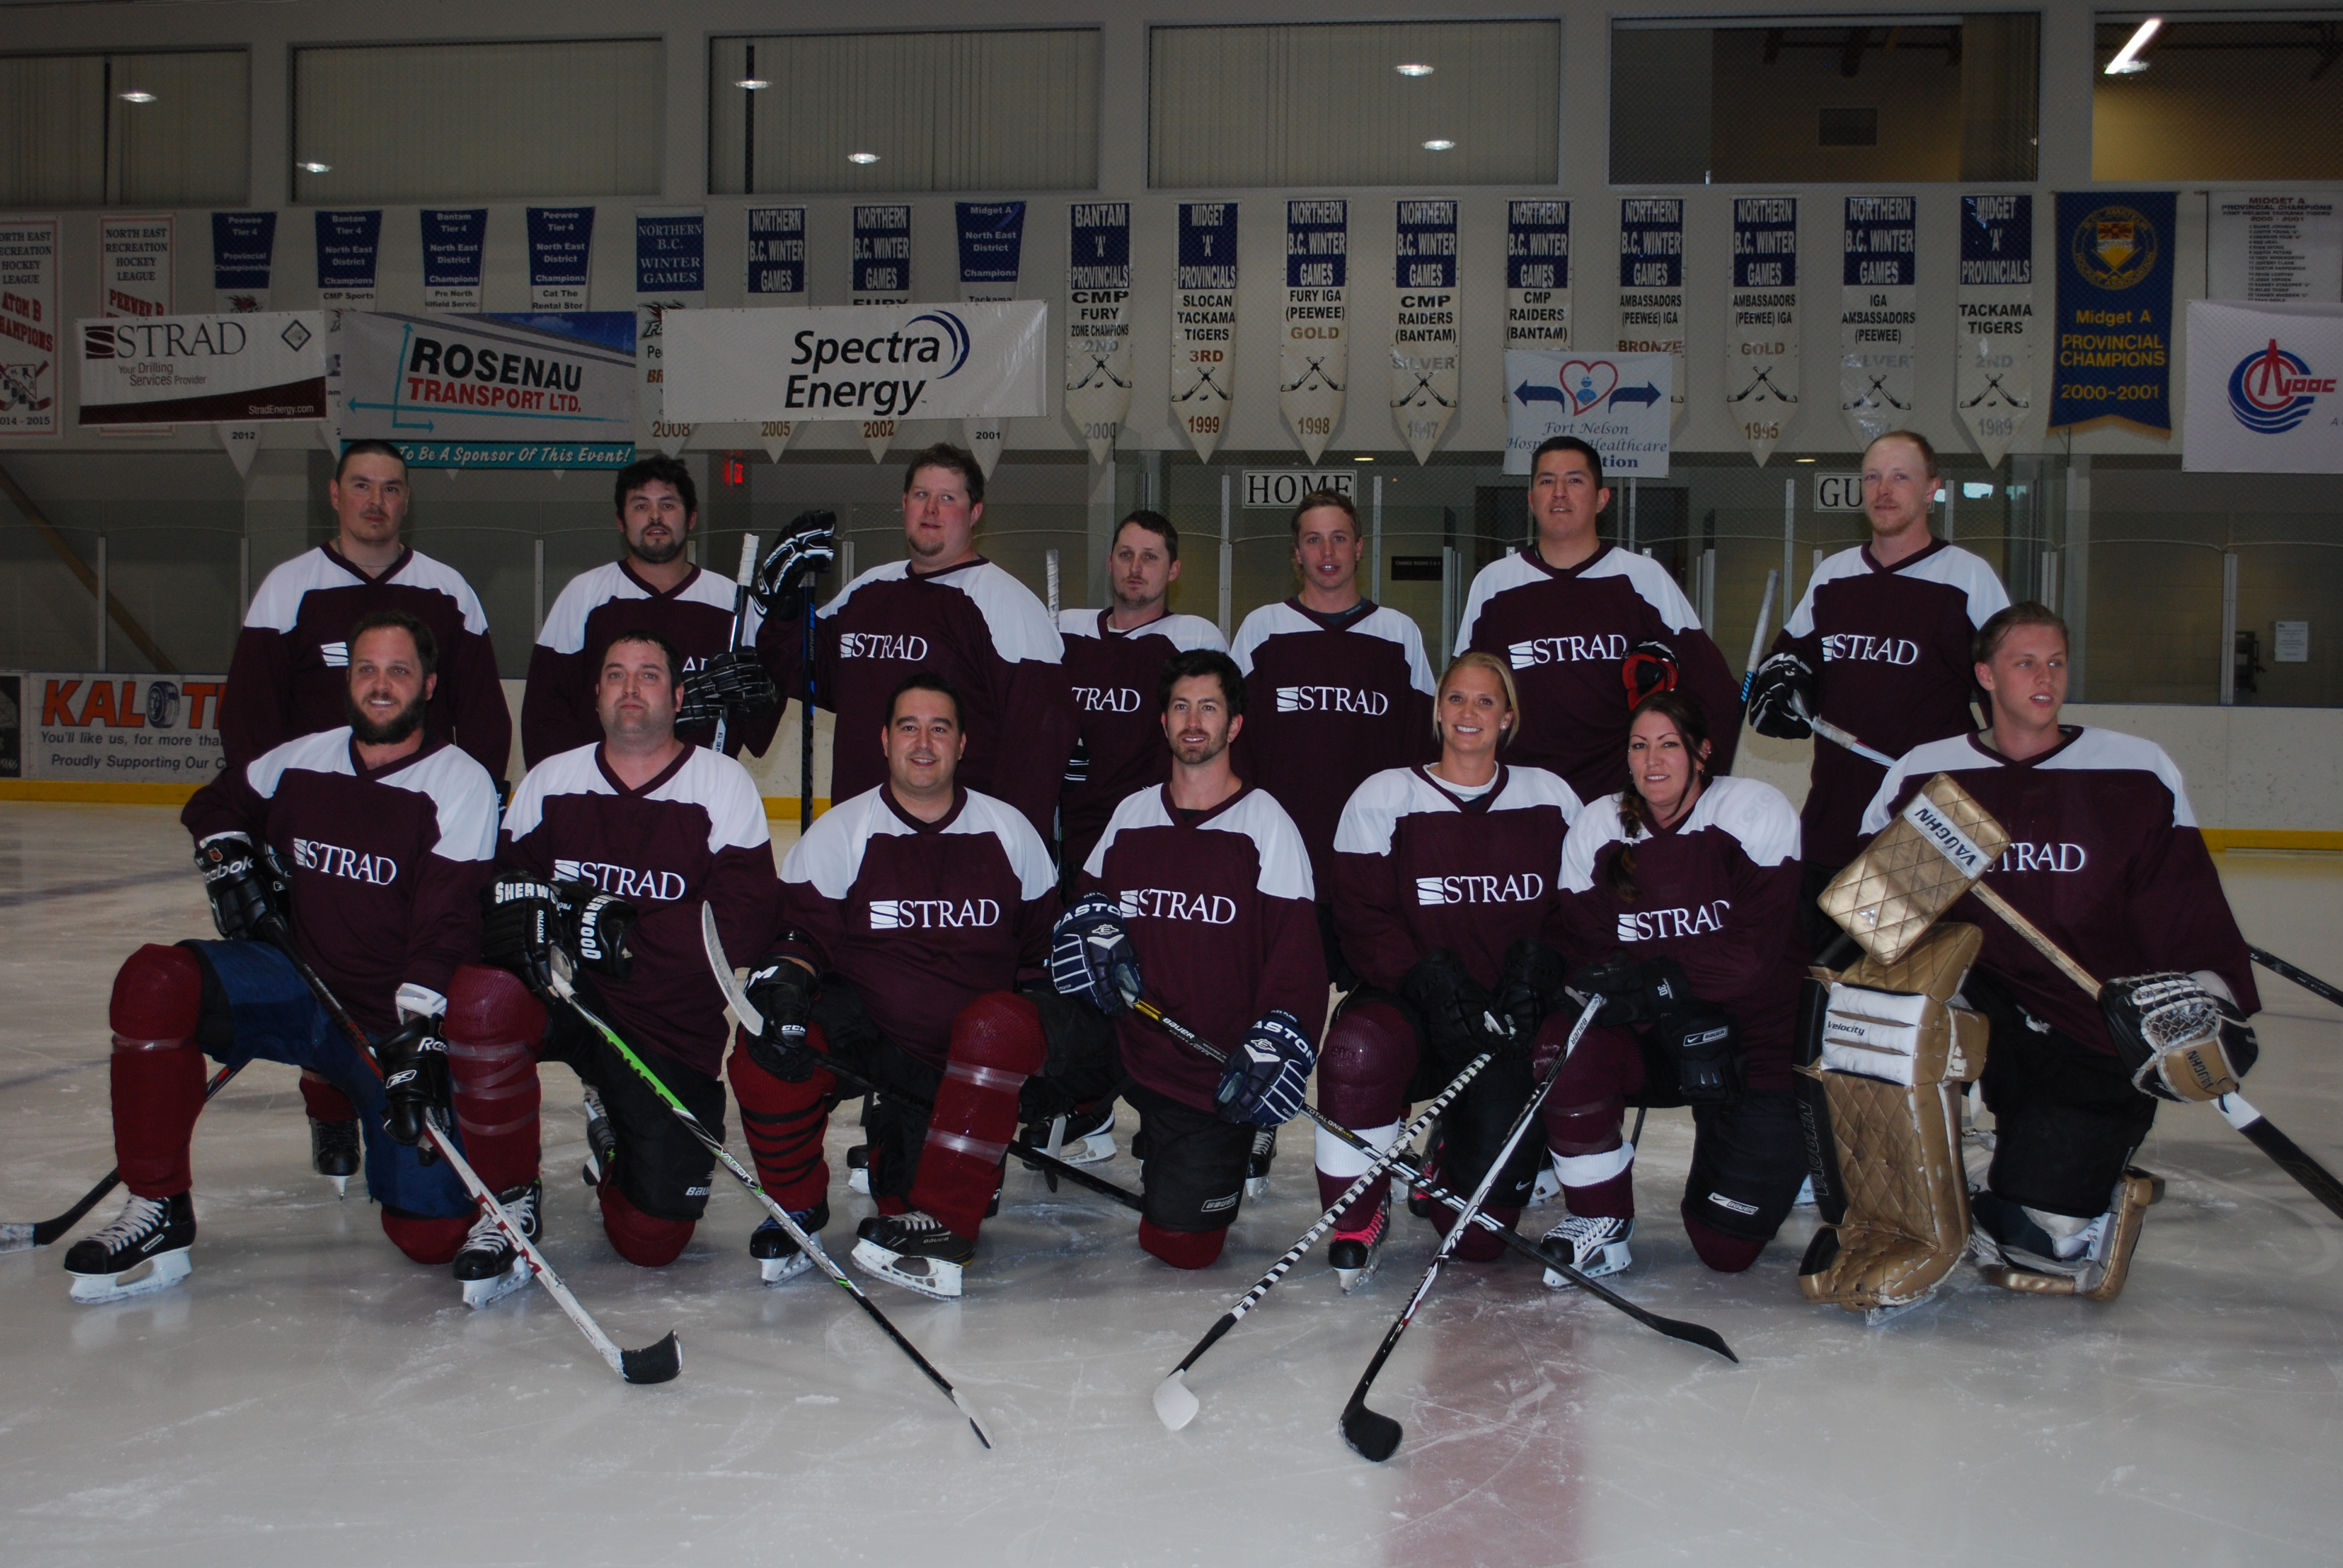 Strad Team Photo